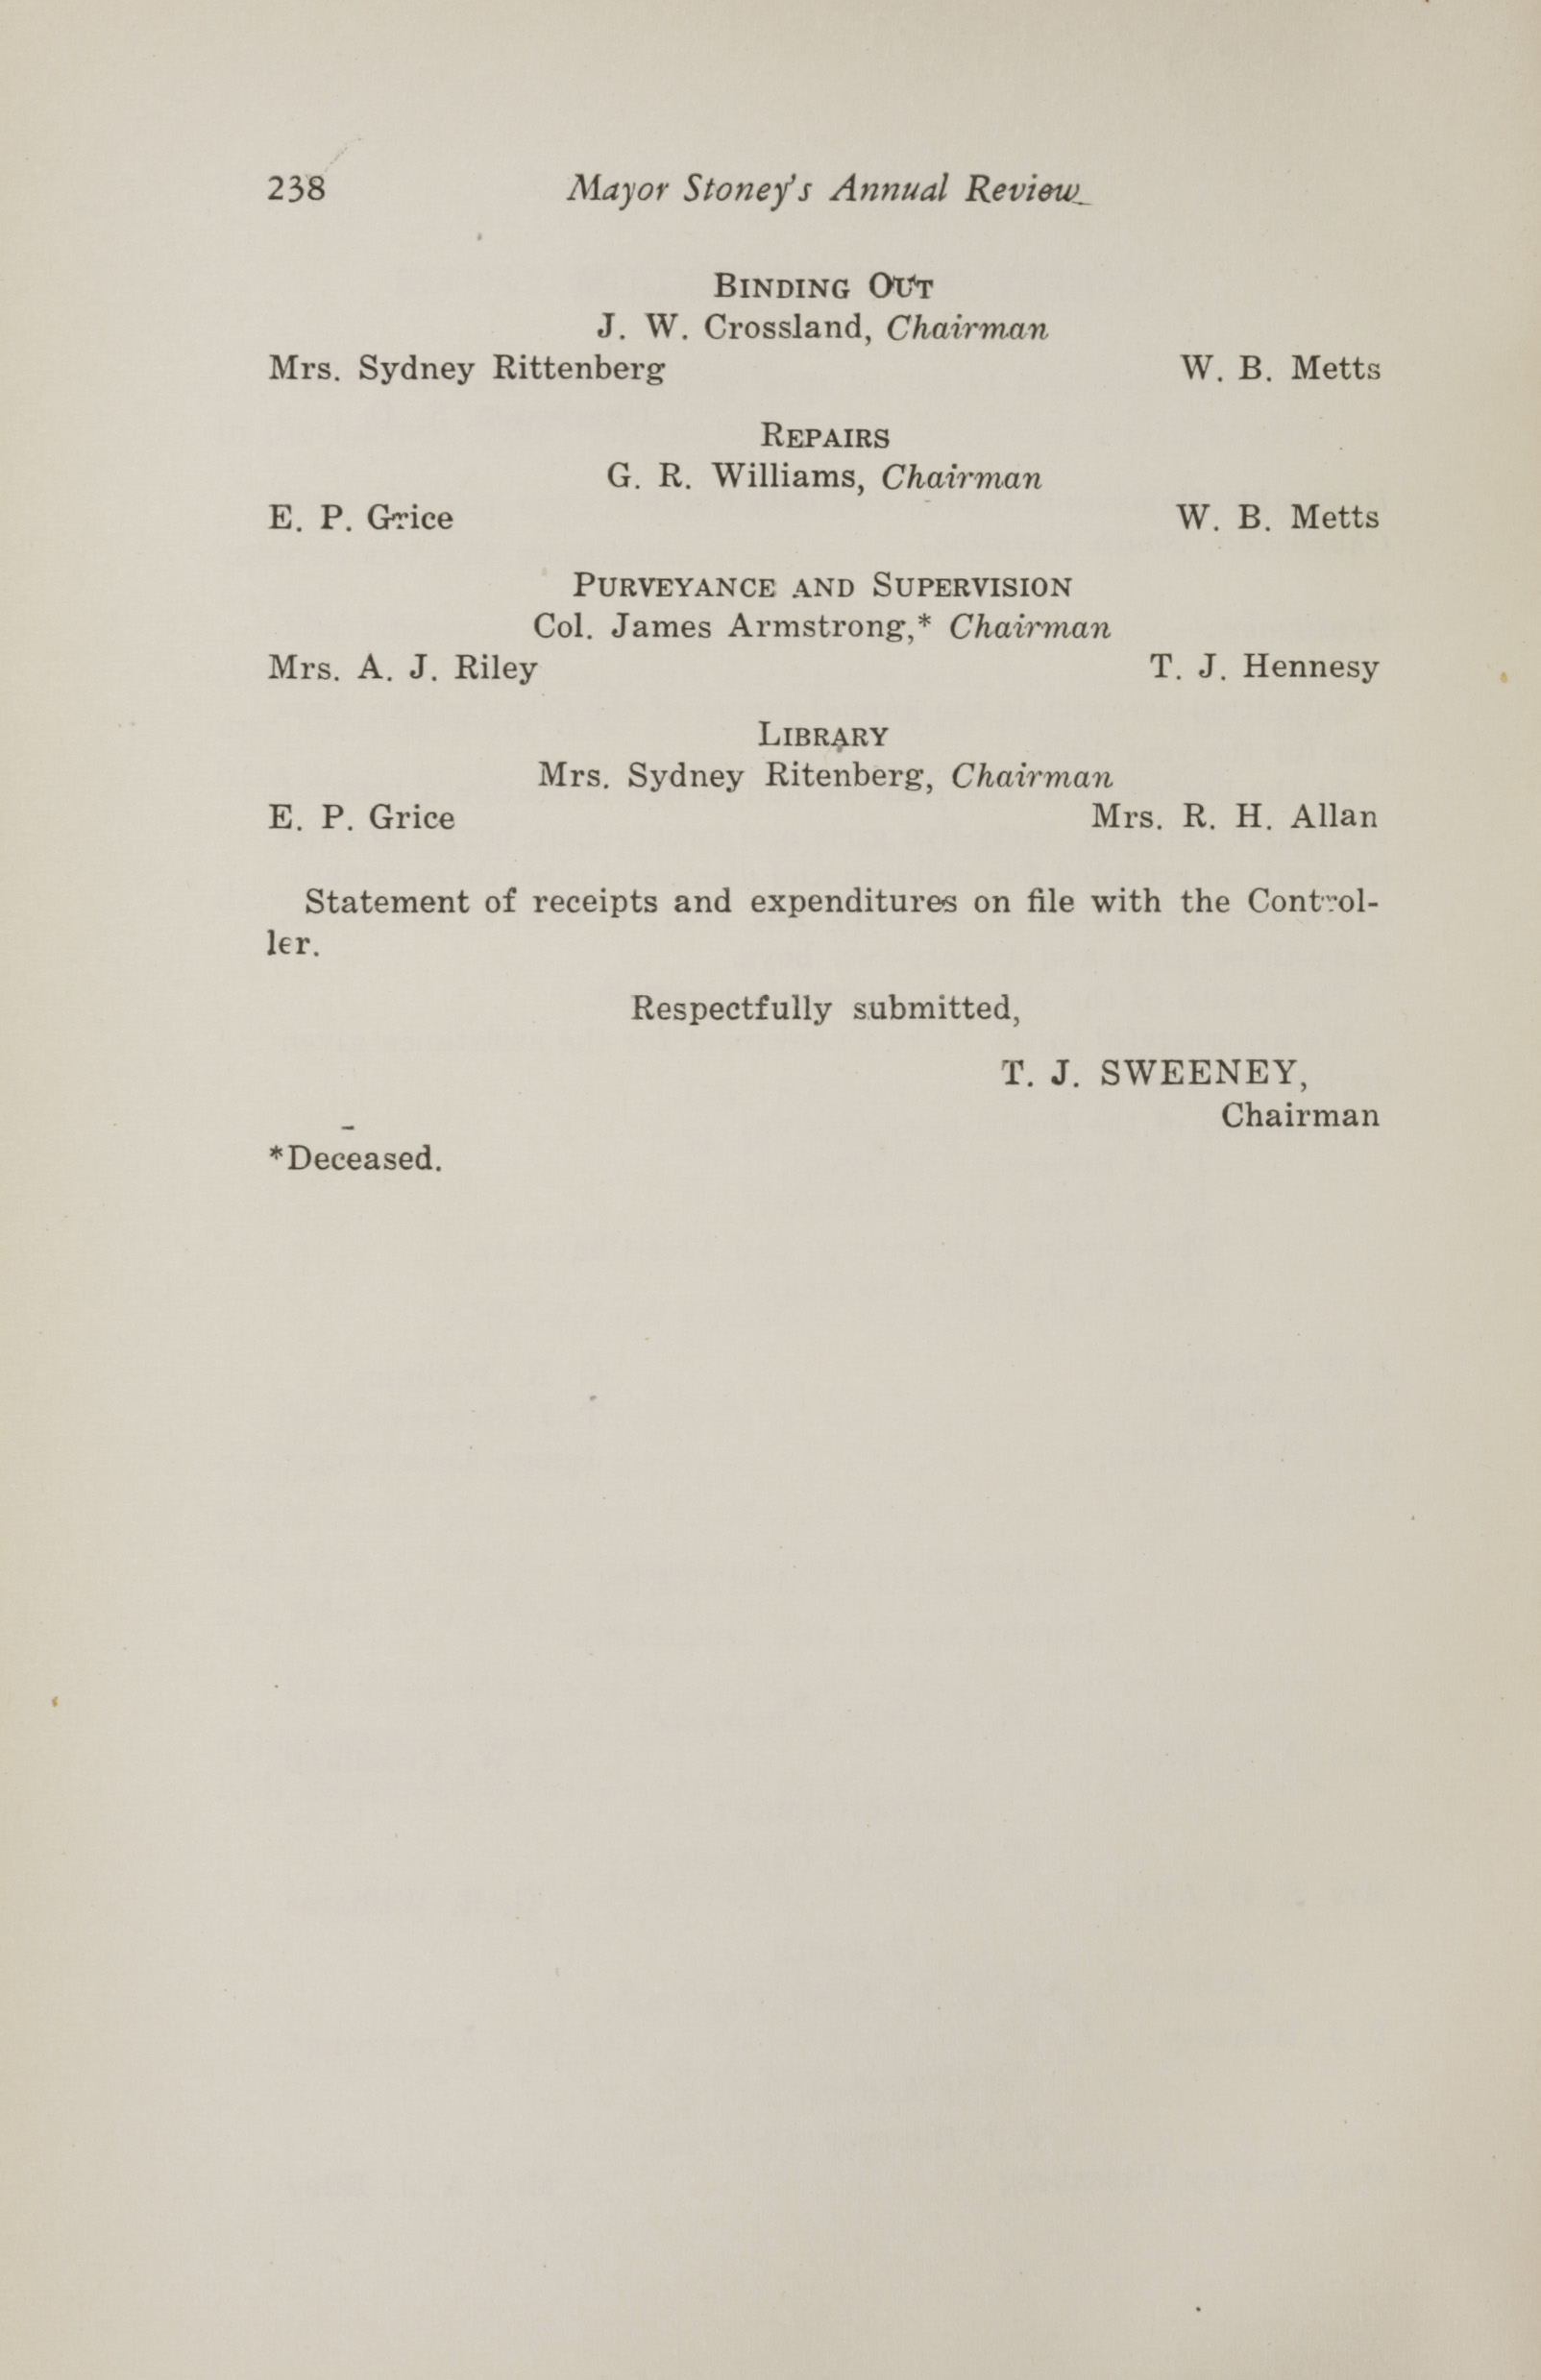 Charleston Yearbook, 1930, page 238